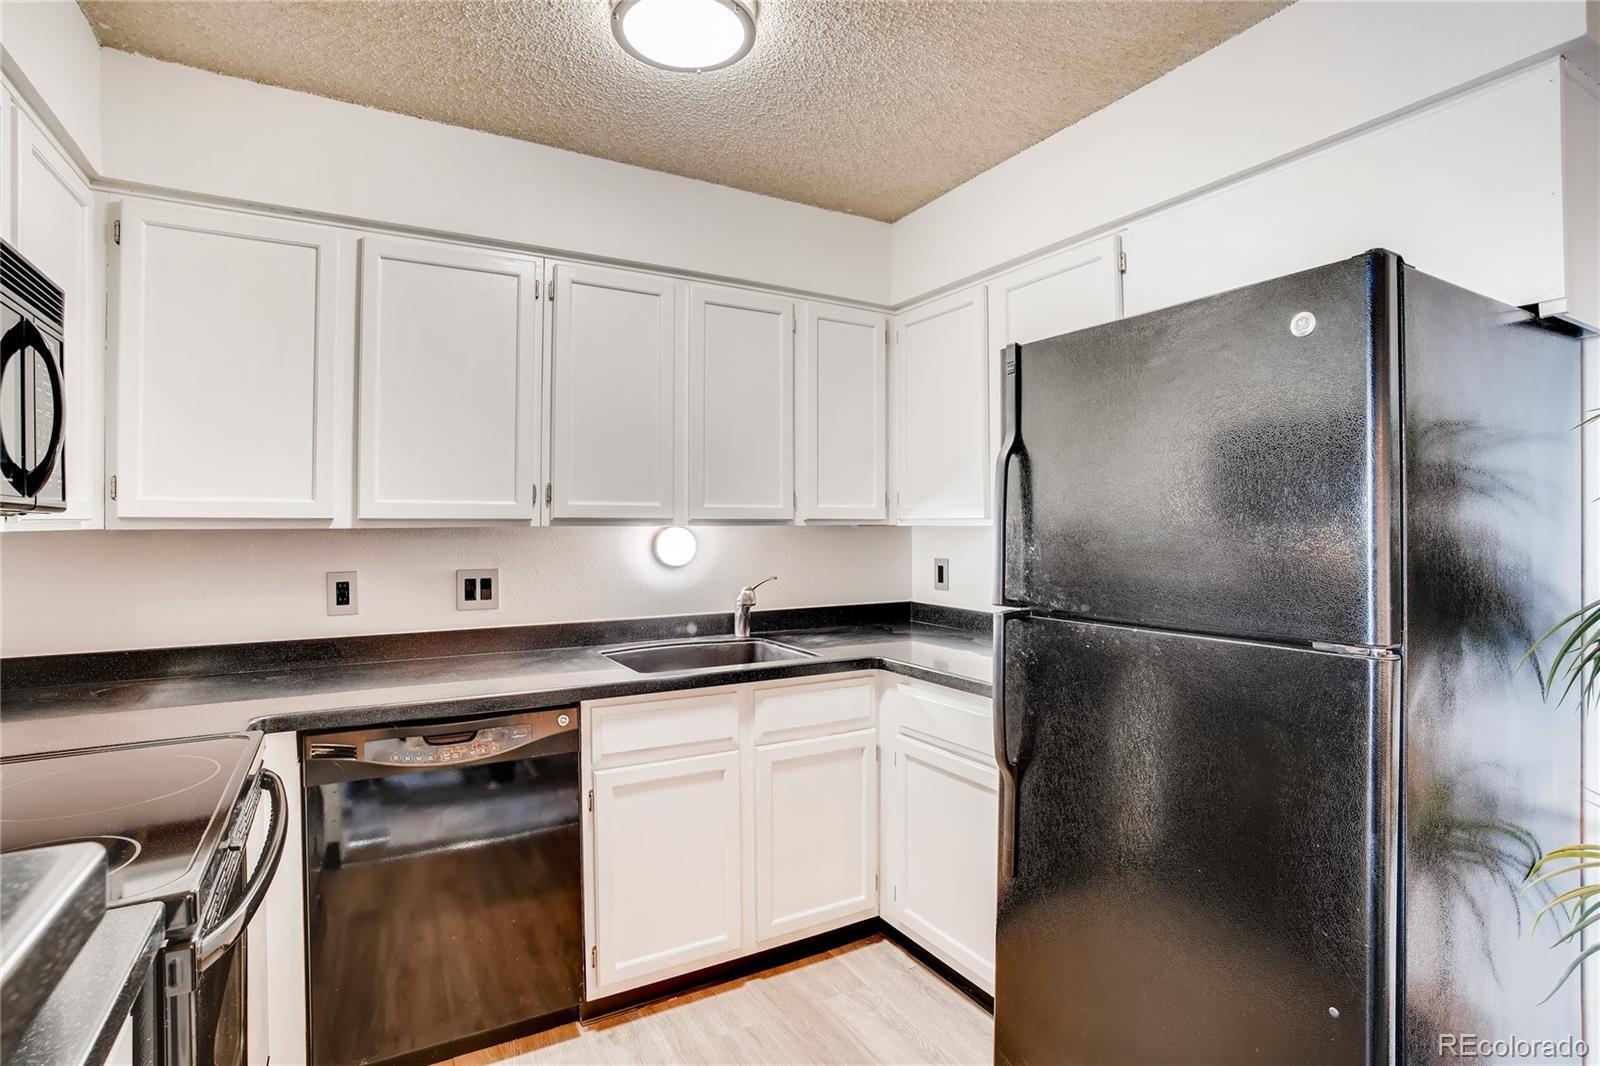 MLS# 5790313 - 8 - 333 Wright Street #306, Lakewood, CO 80228